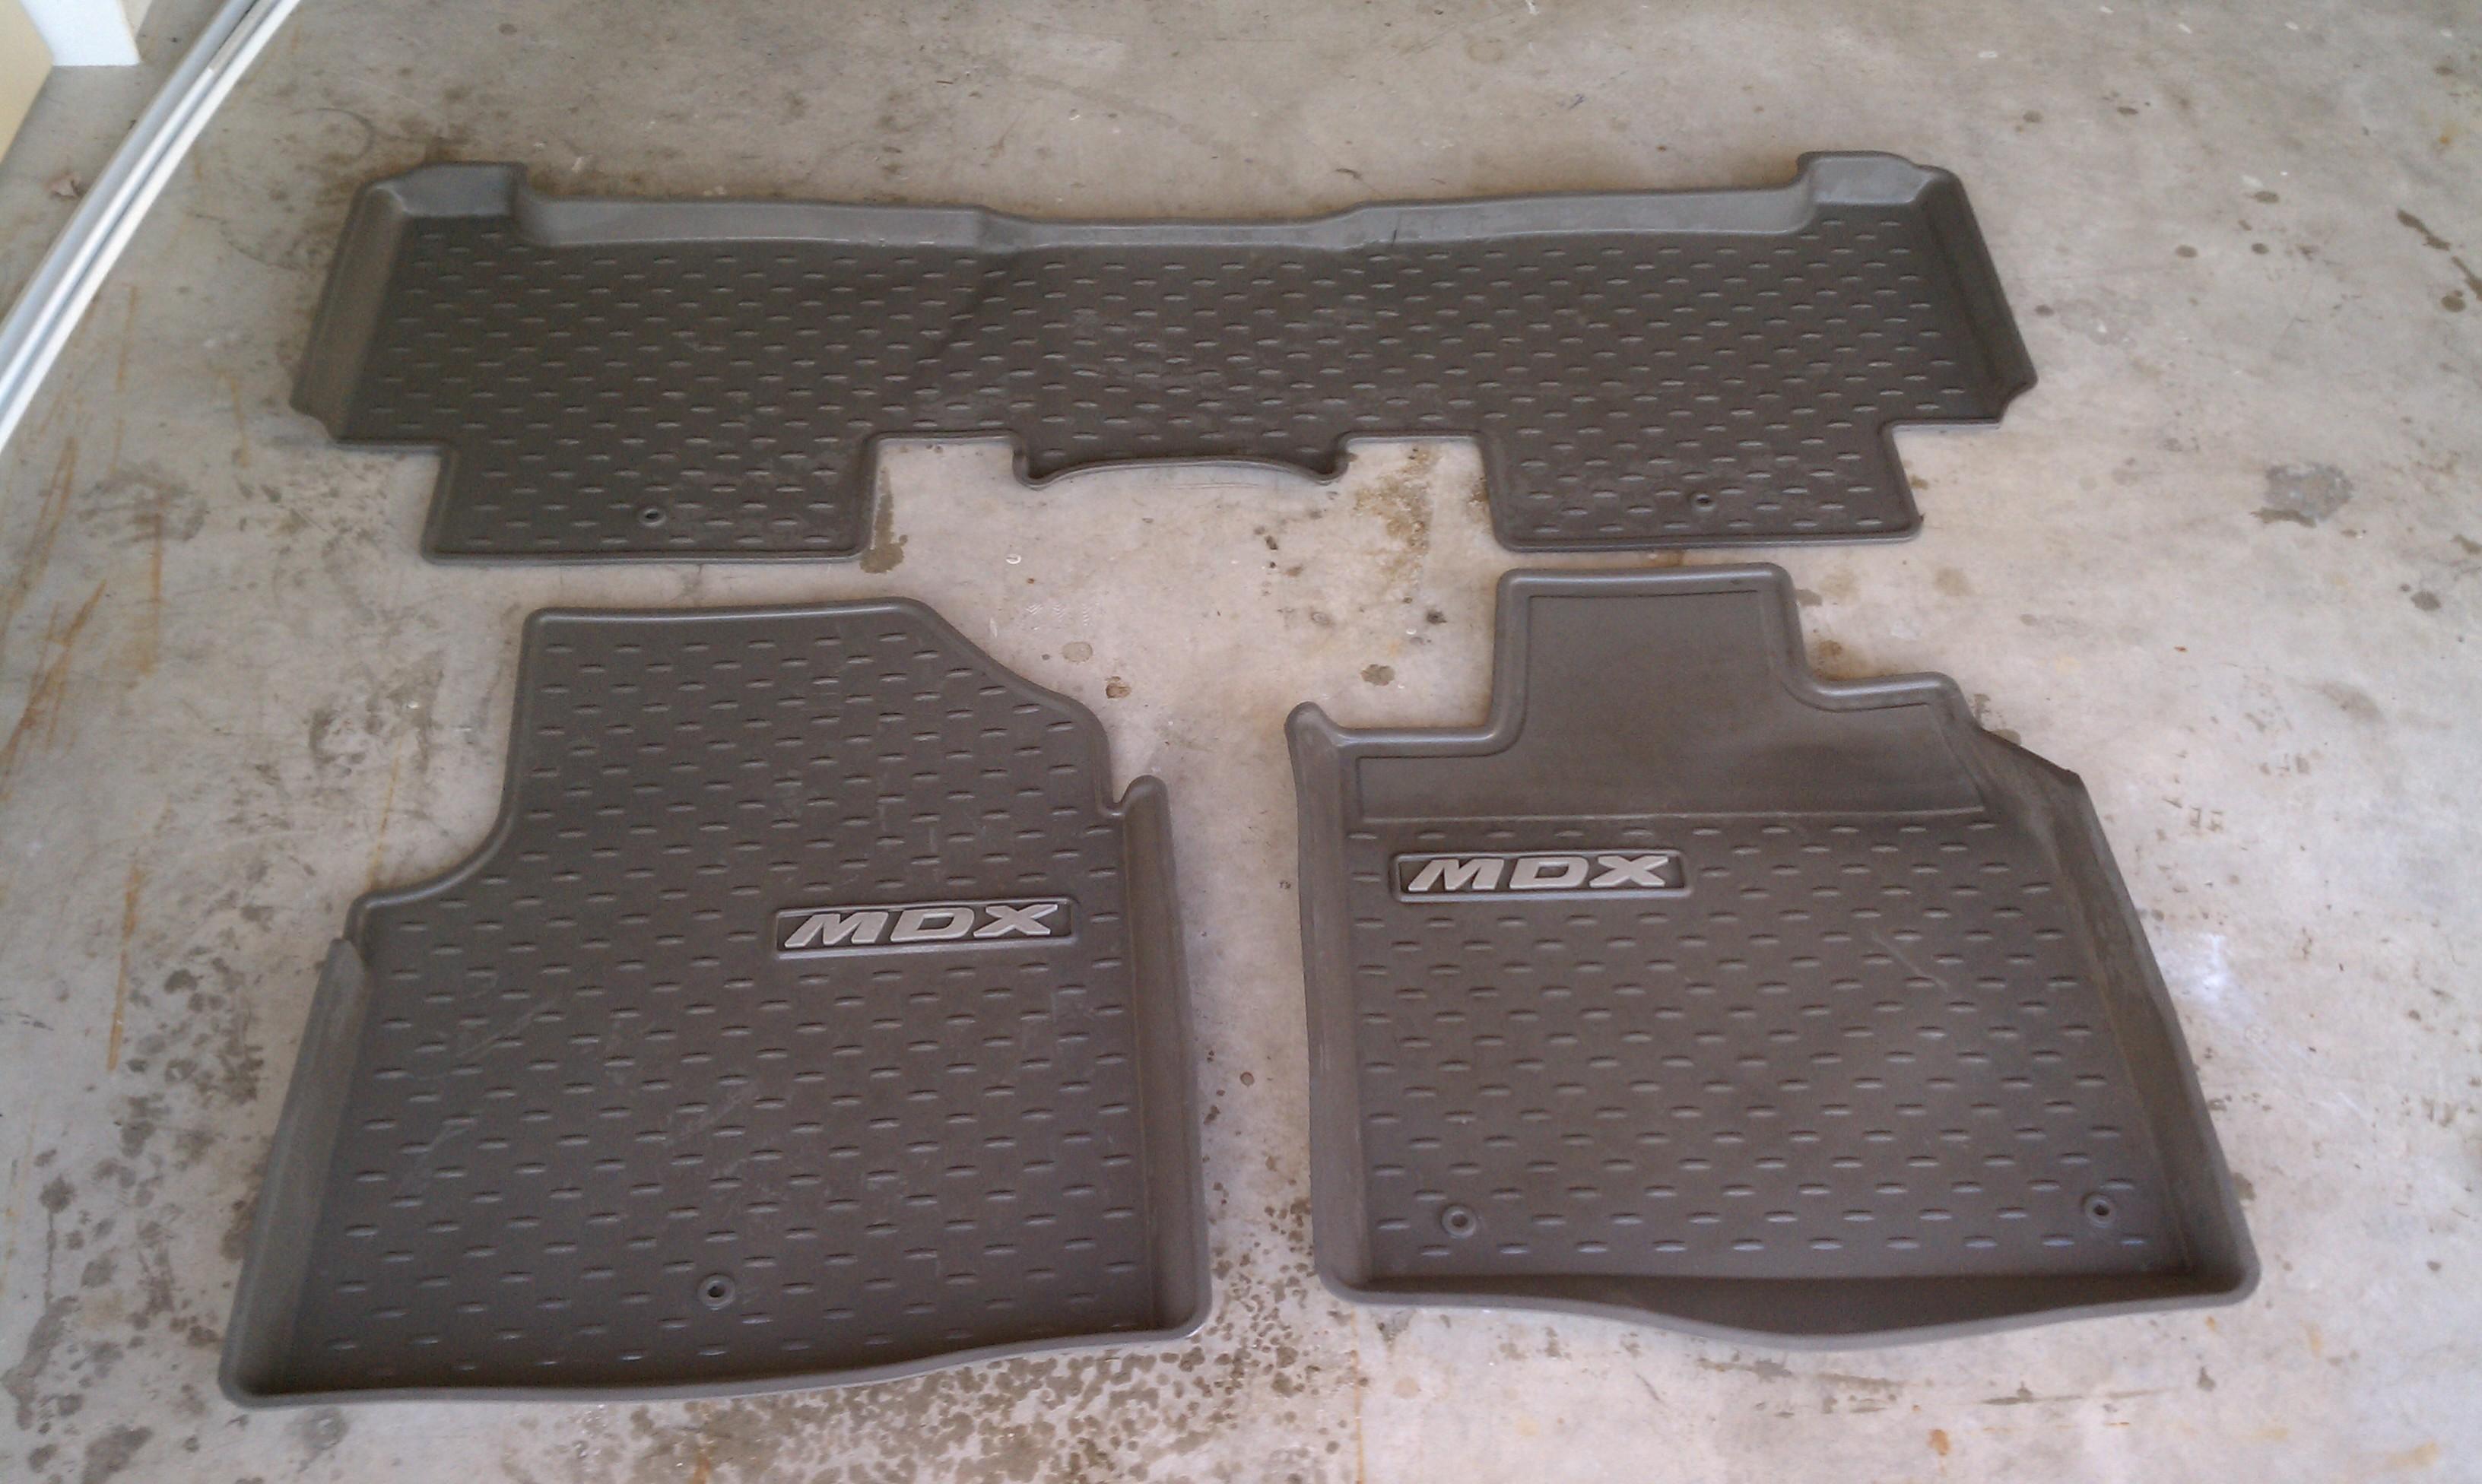 For Sale MDX AllWeather Floor Mats Acura MDX Forum - Acura mdx floor mats